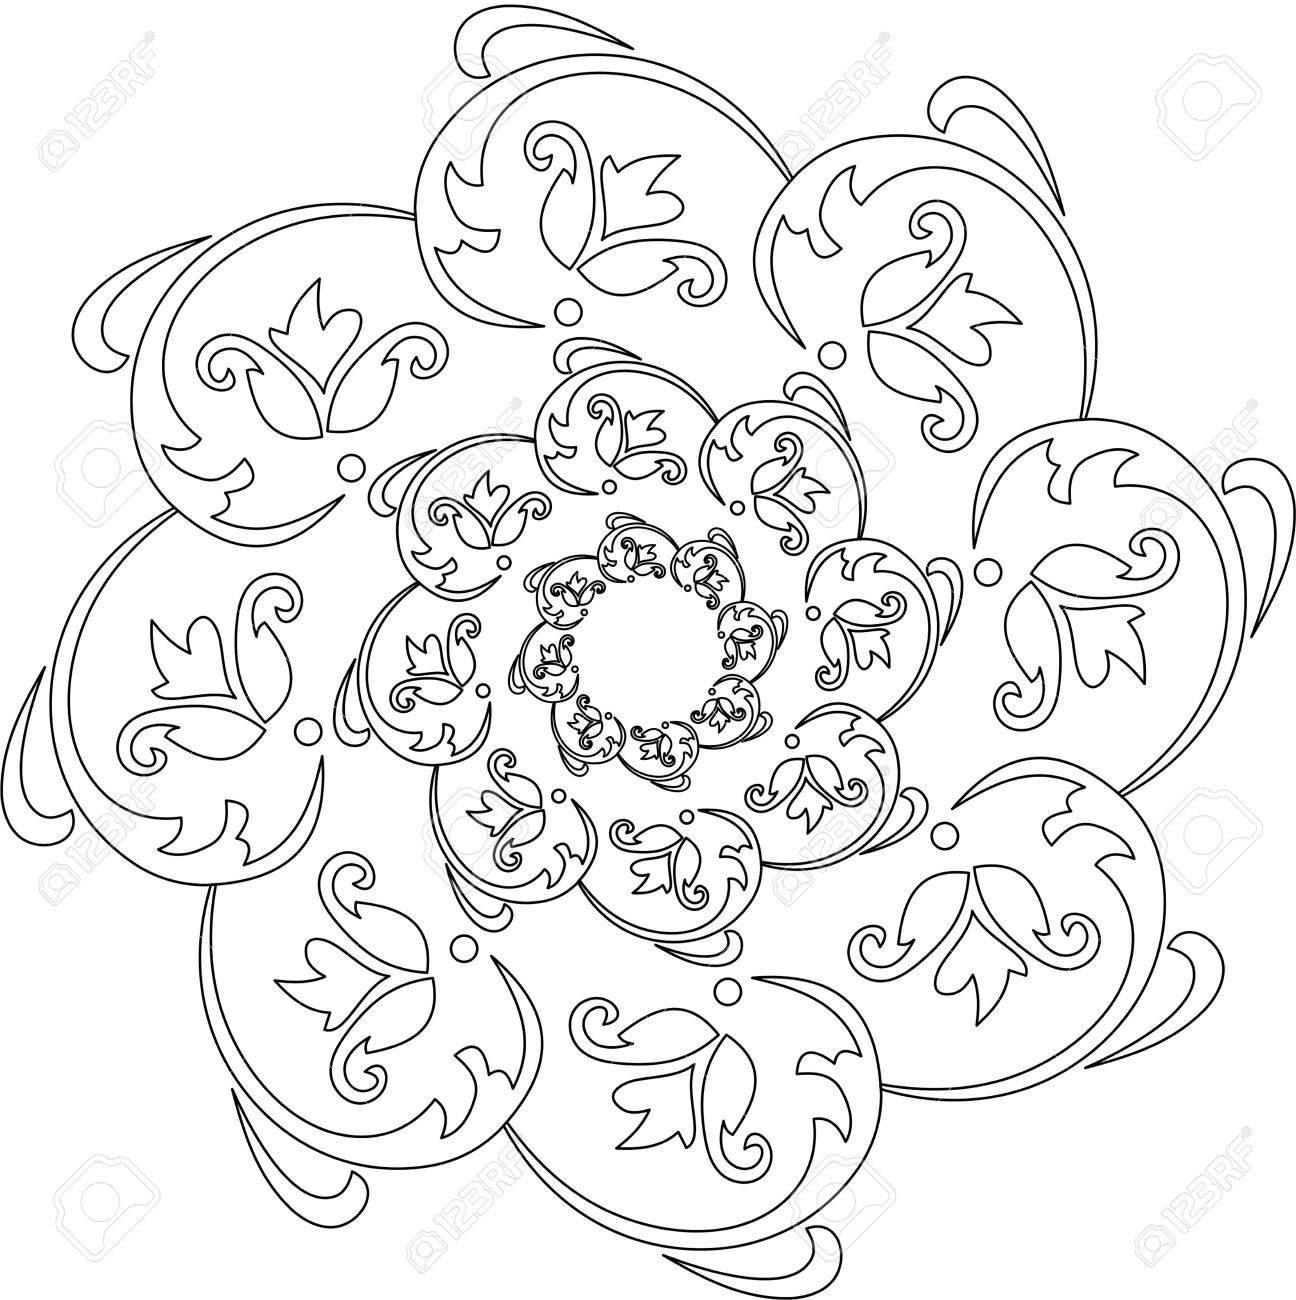 Schwarz Weiß Mandala Mandala Malvorlagen Ausmalbilder Mandala